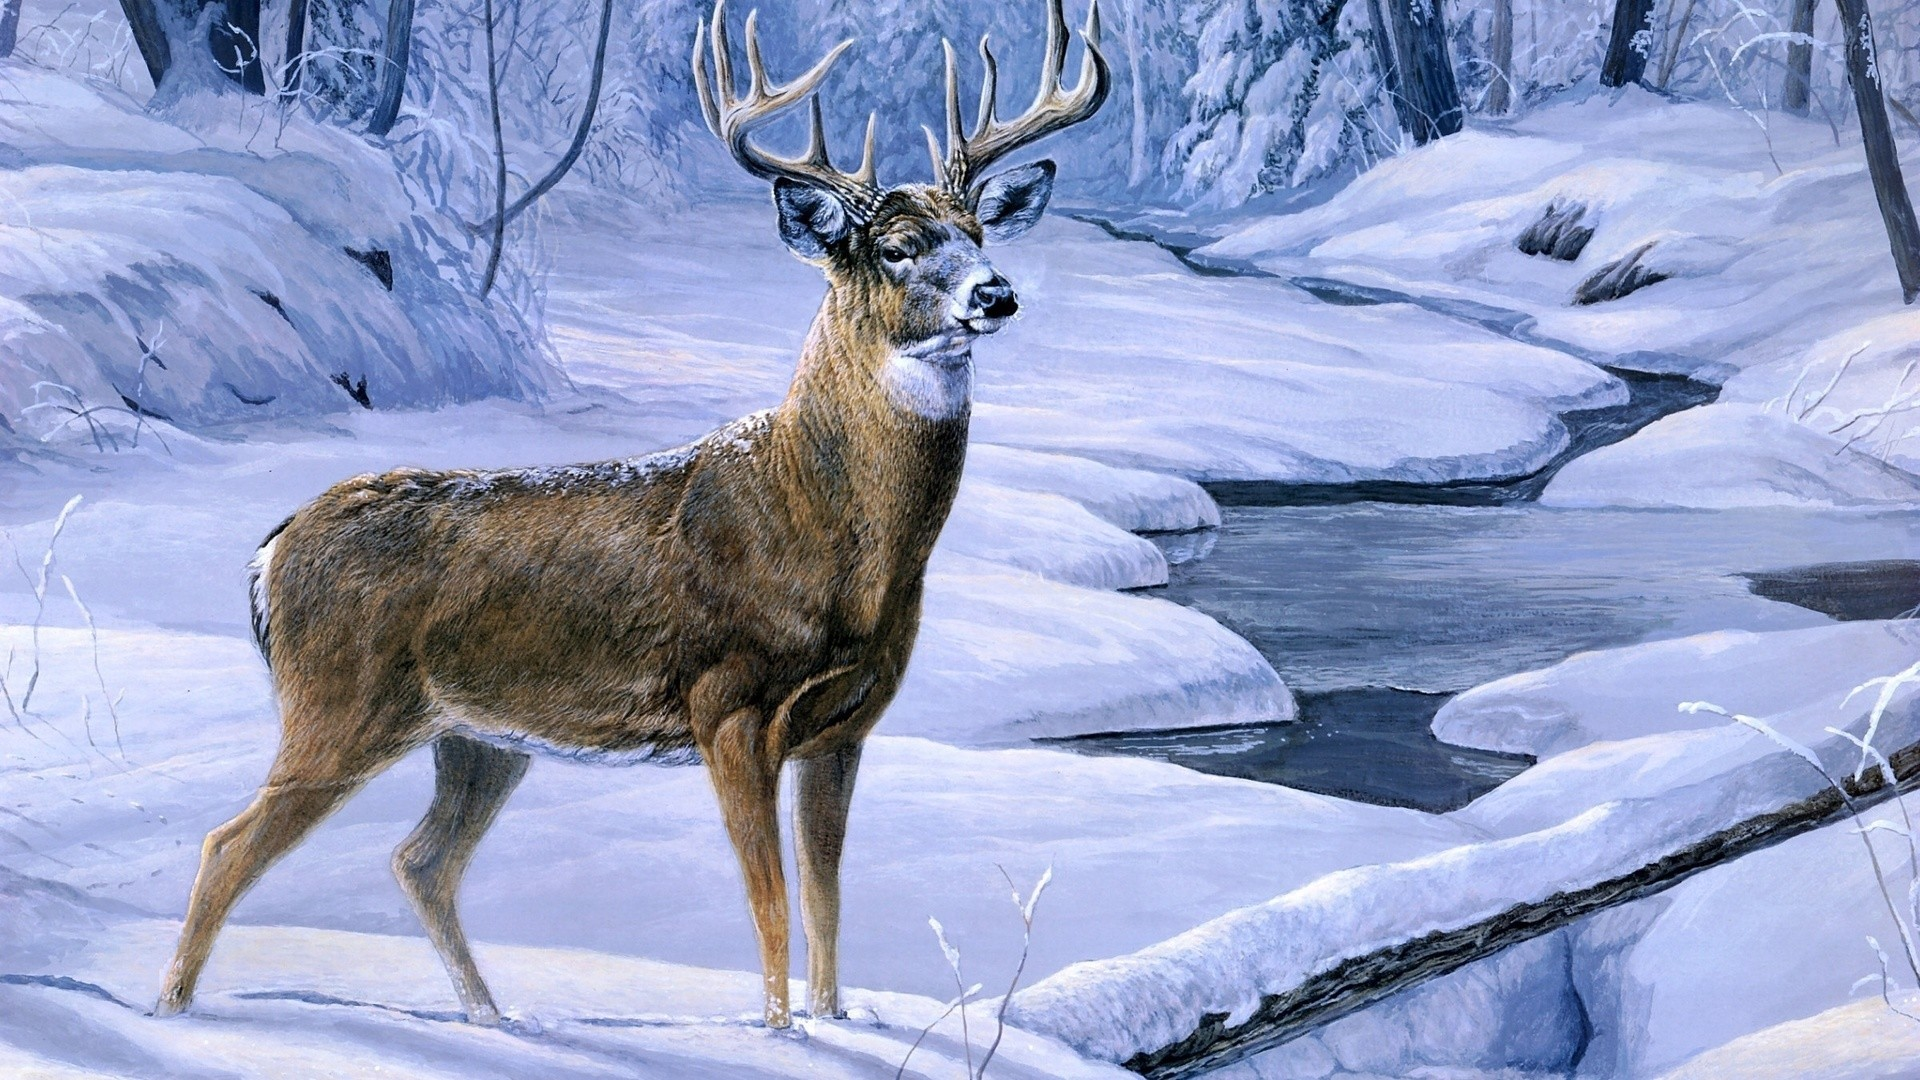 Cool Deer Wallpapers | HD Wallpapers | Pinterest | Deer wallpaper, Wallpaper  and Wallpaper backgrounds